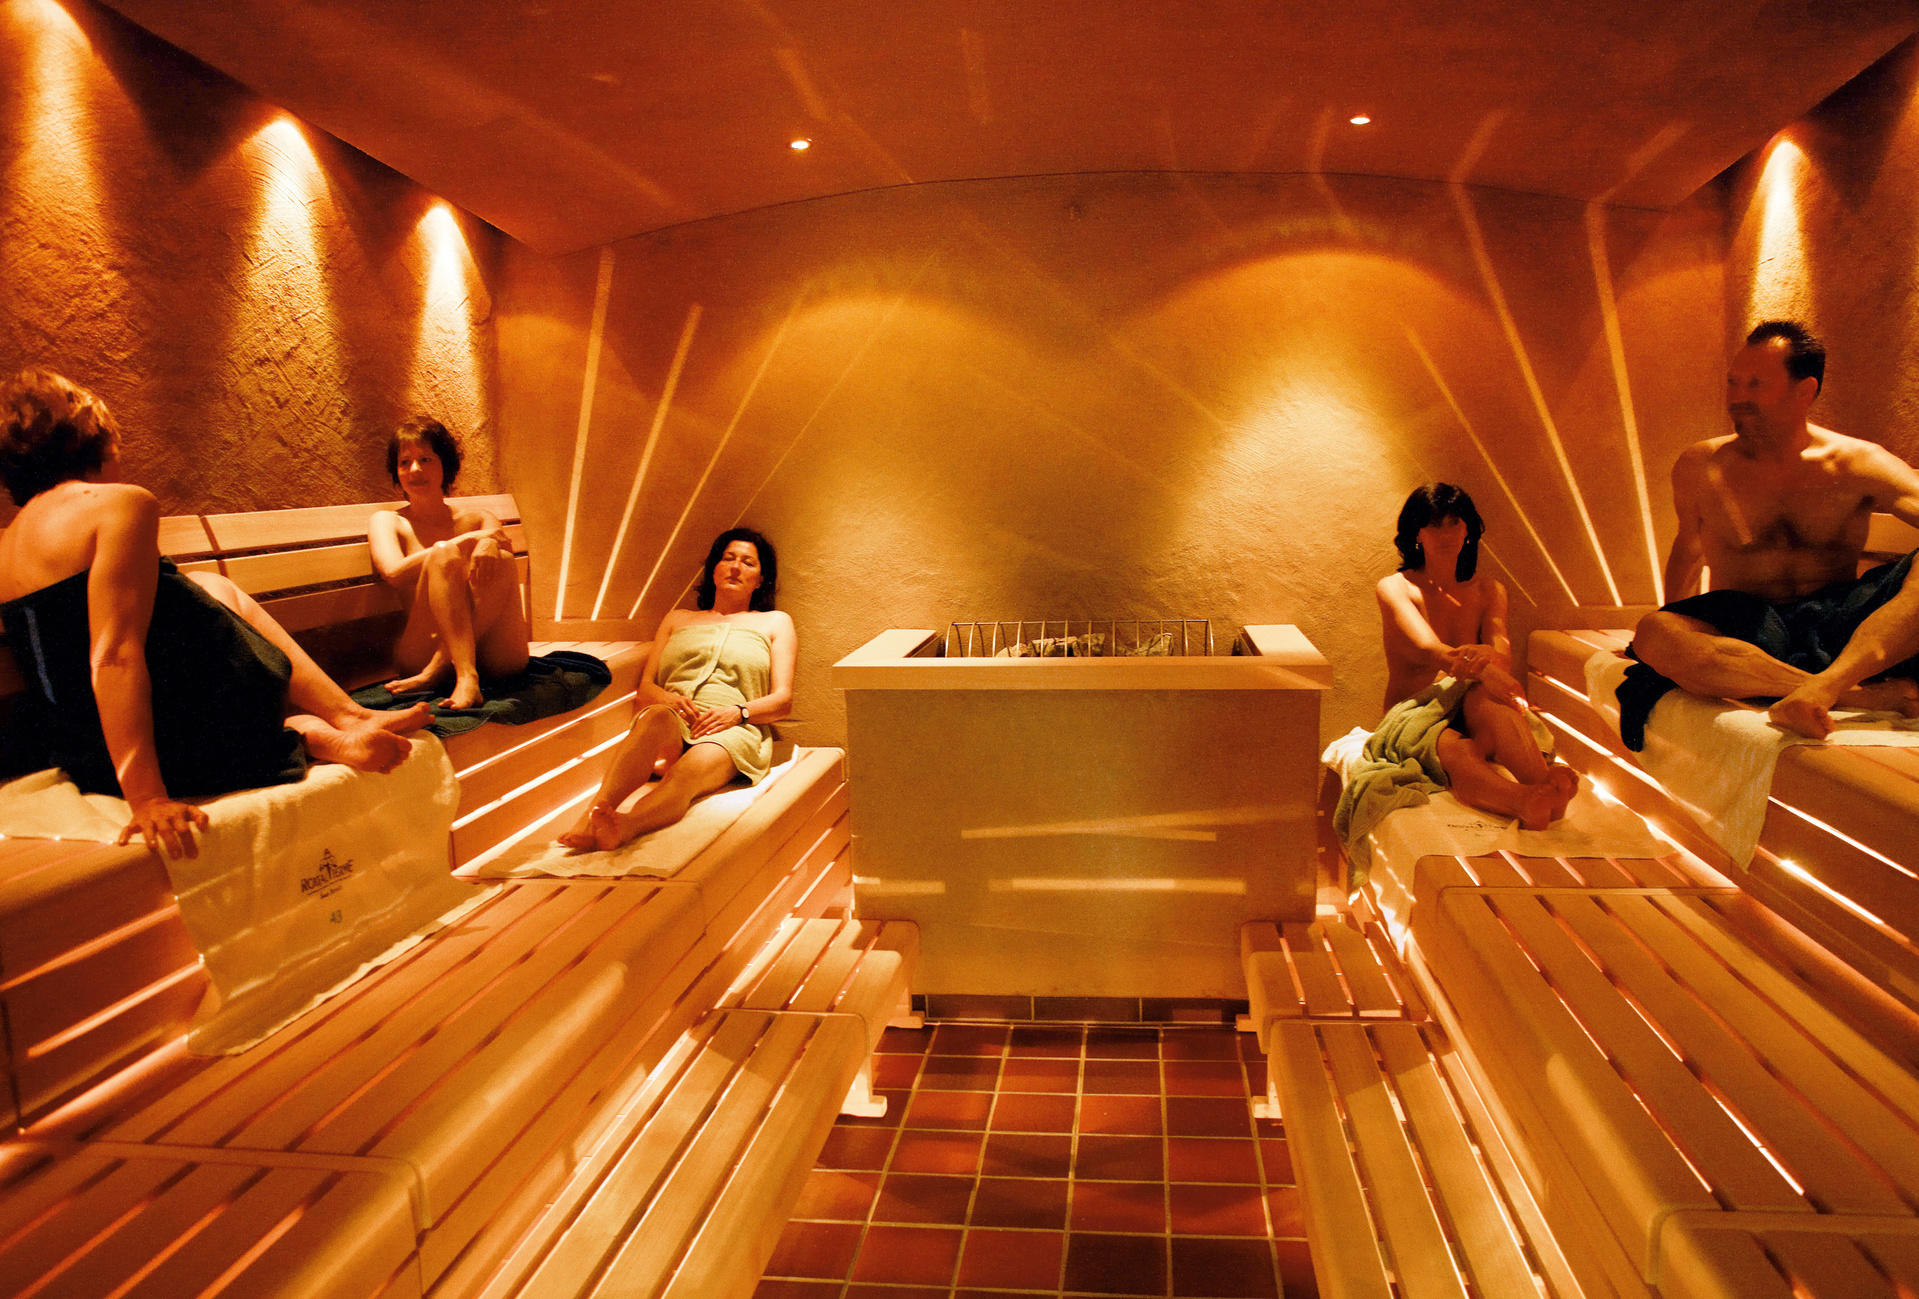 vitarium saunawelt rottal terme bad birnbach thermen bayern therme hotel mit bademantelgang. Black Bedroom Furniture Sets. Home Design Ideas